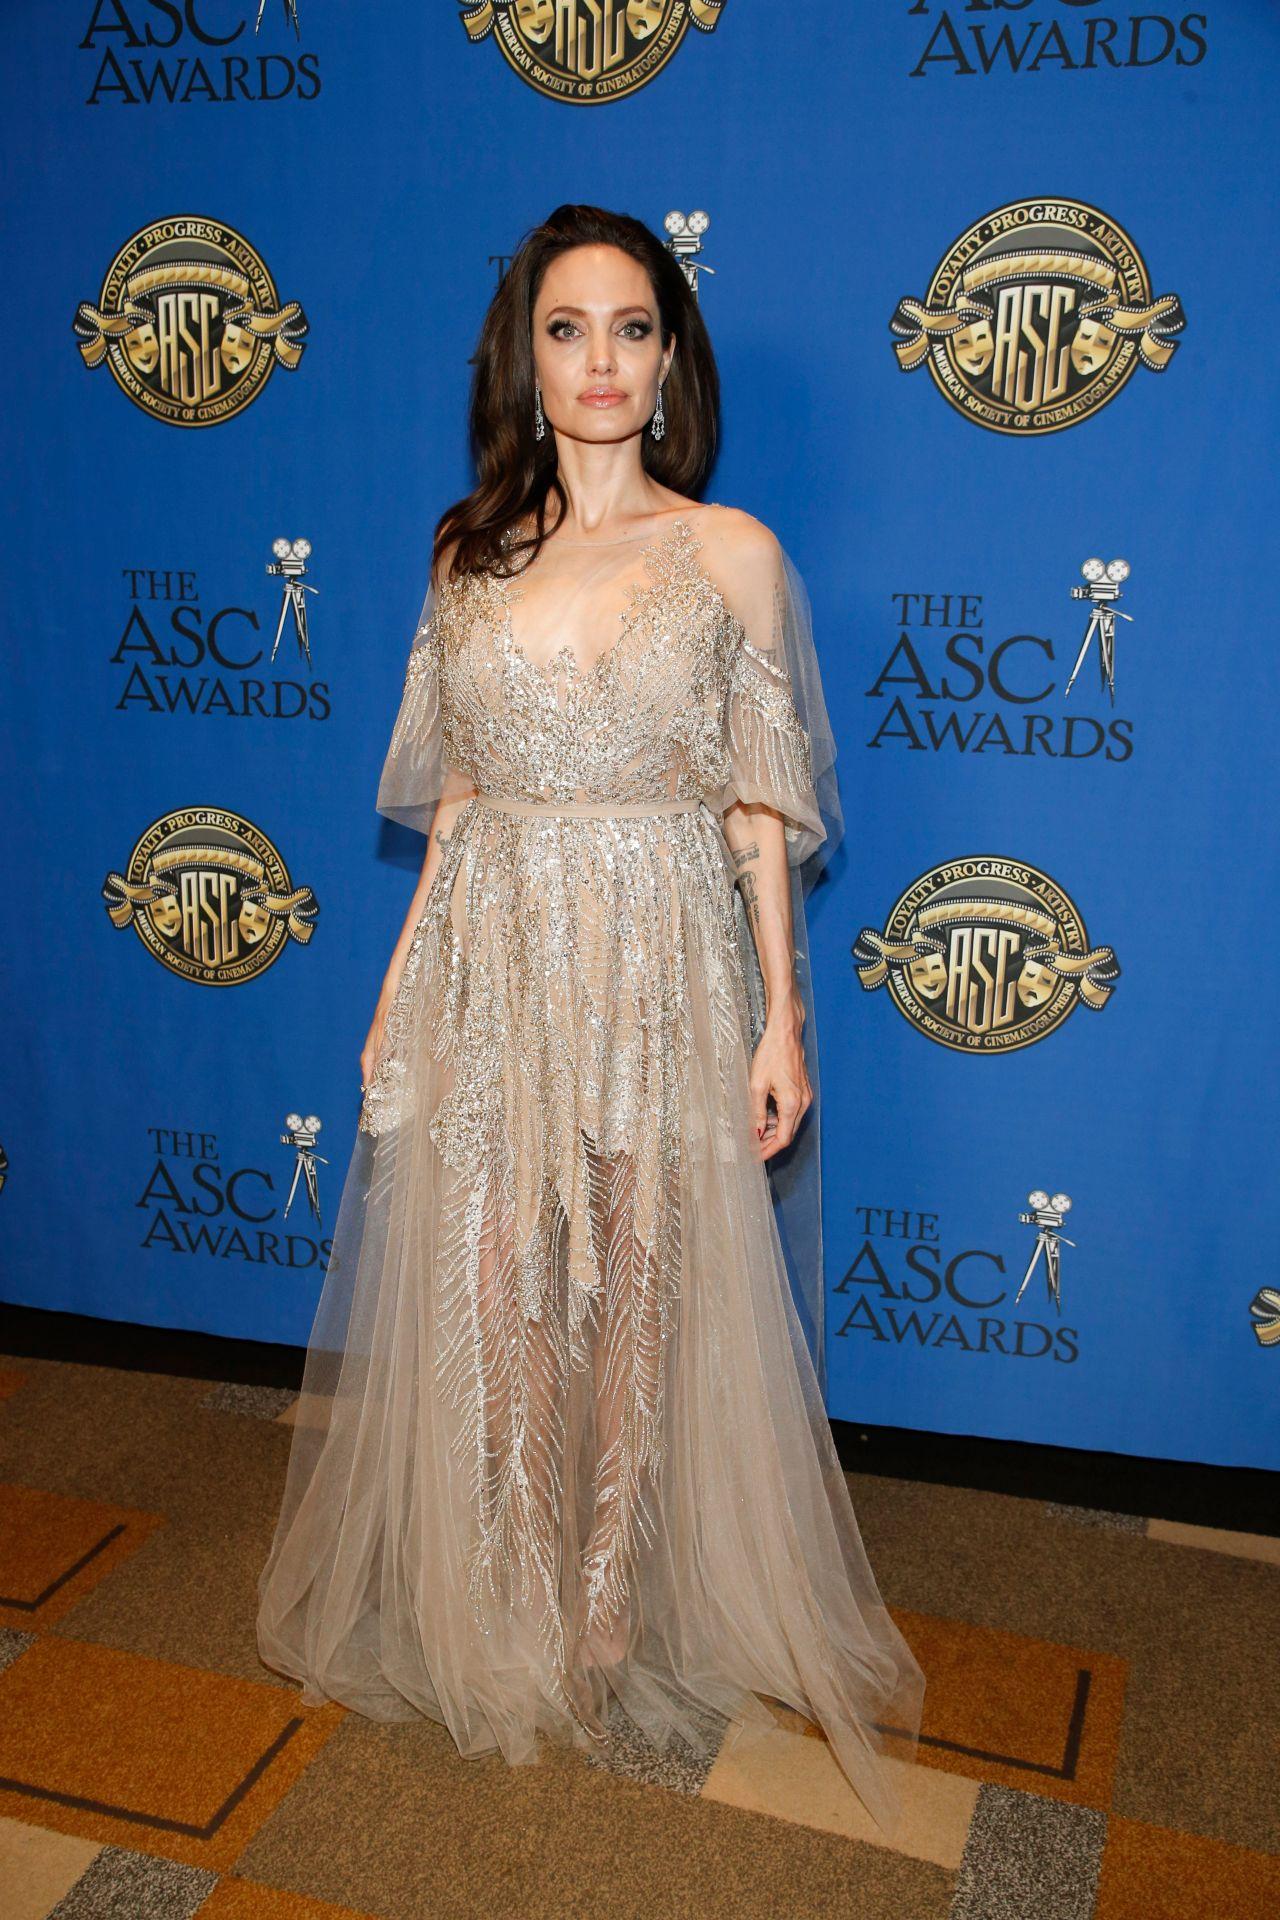 http://celebmafia.com/wp-content/uploads/2018/02/angelina-jolie-2018-asc-awards-in-la-15.jpg